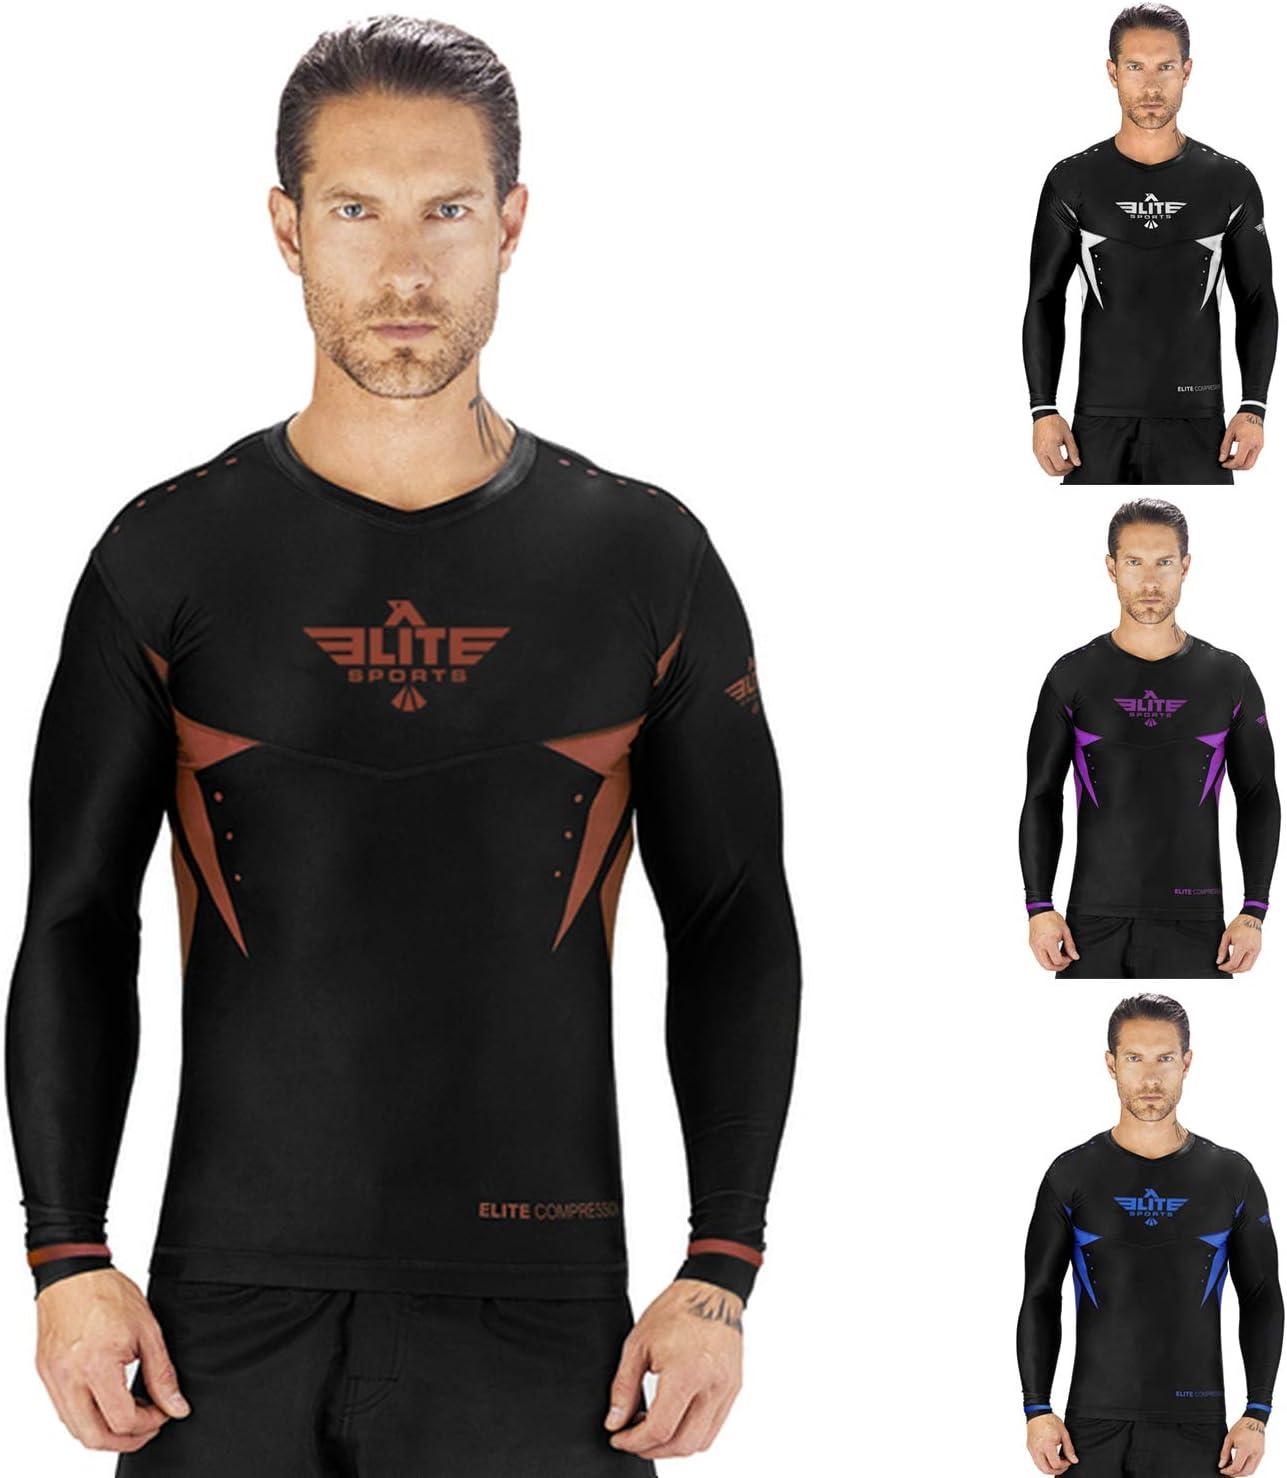 No-Gi Elite Sports Star Full Sleeve Compression BJJ MMA Cross Training Rash Guard